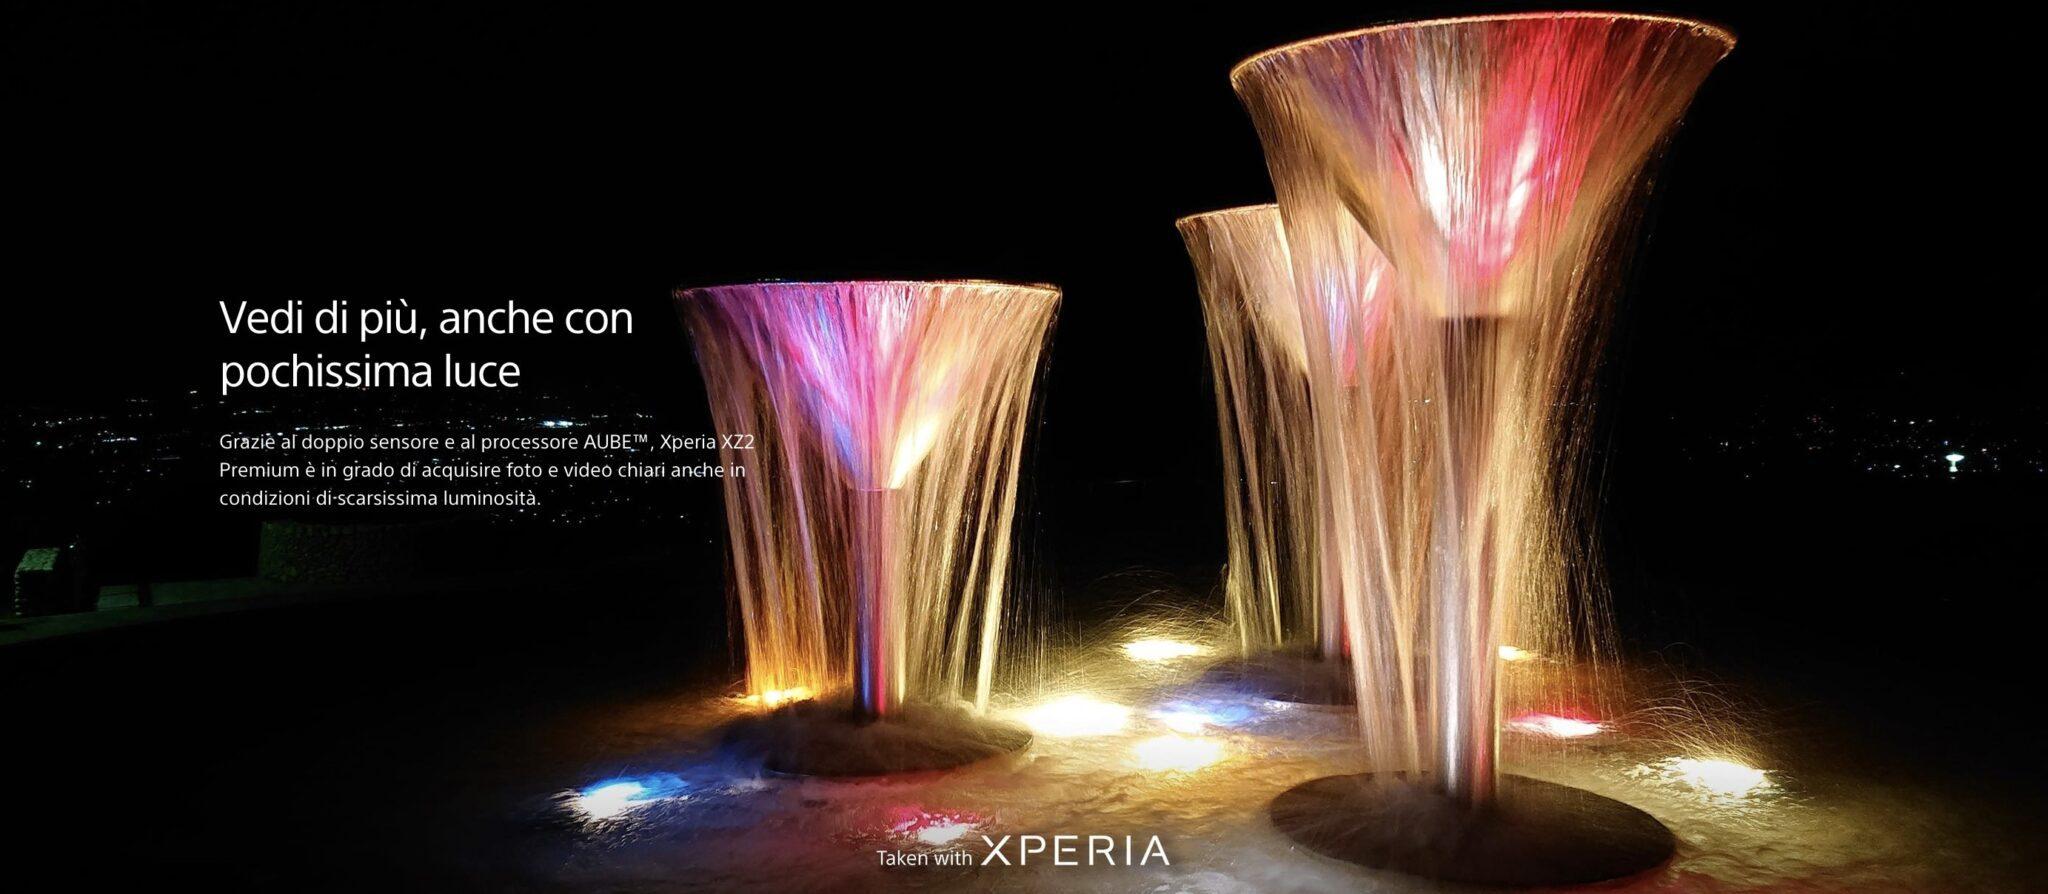 Xperia multi-camera - Da Xperia XZ2 Premium a Xperia 1